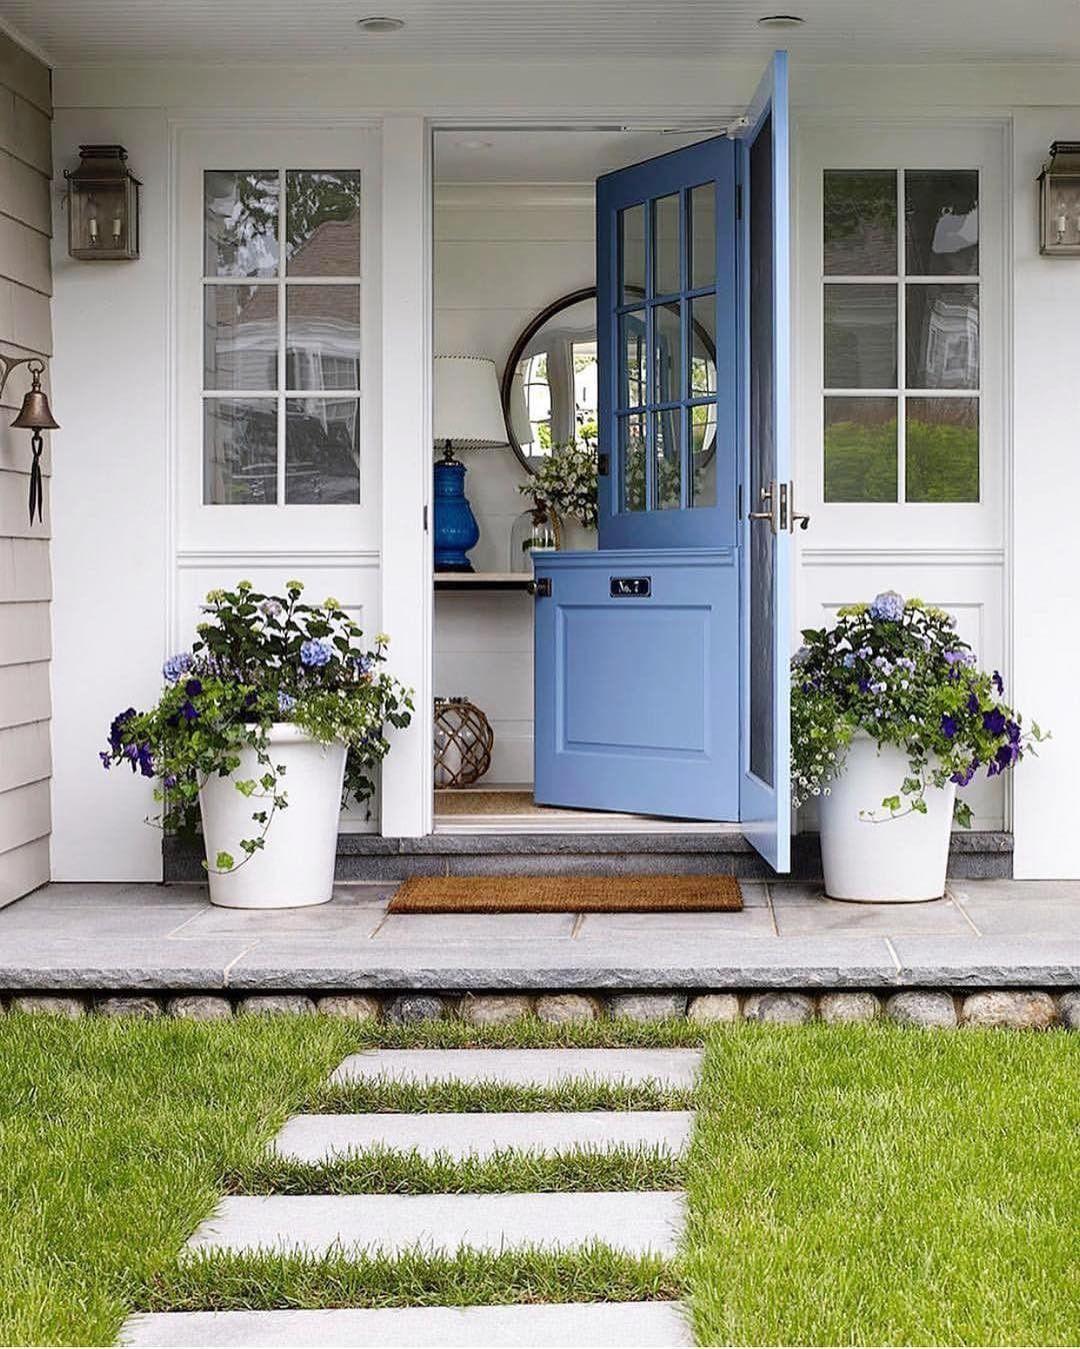 Better homes gardens on instagram only 27 days until - Better homes and gardens interior designer ...